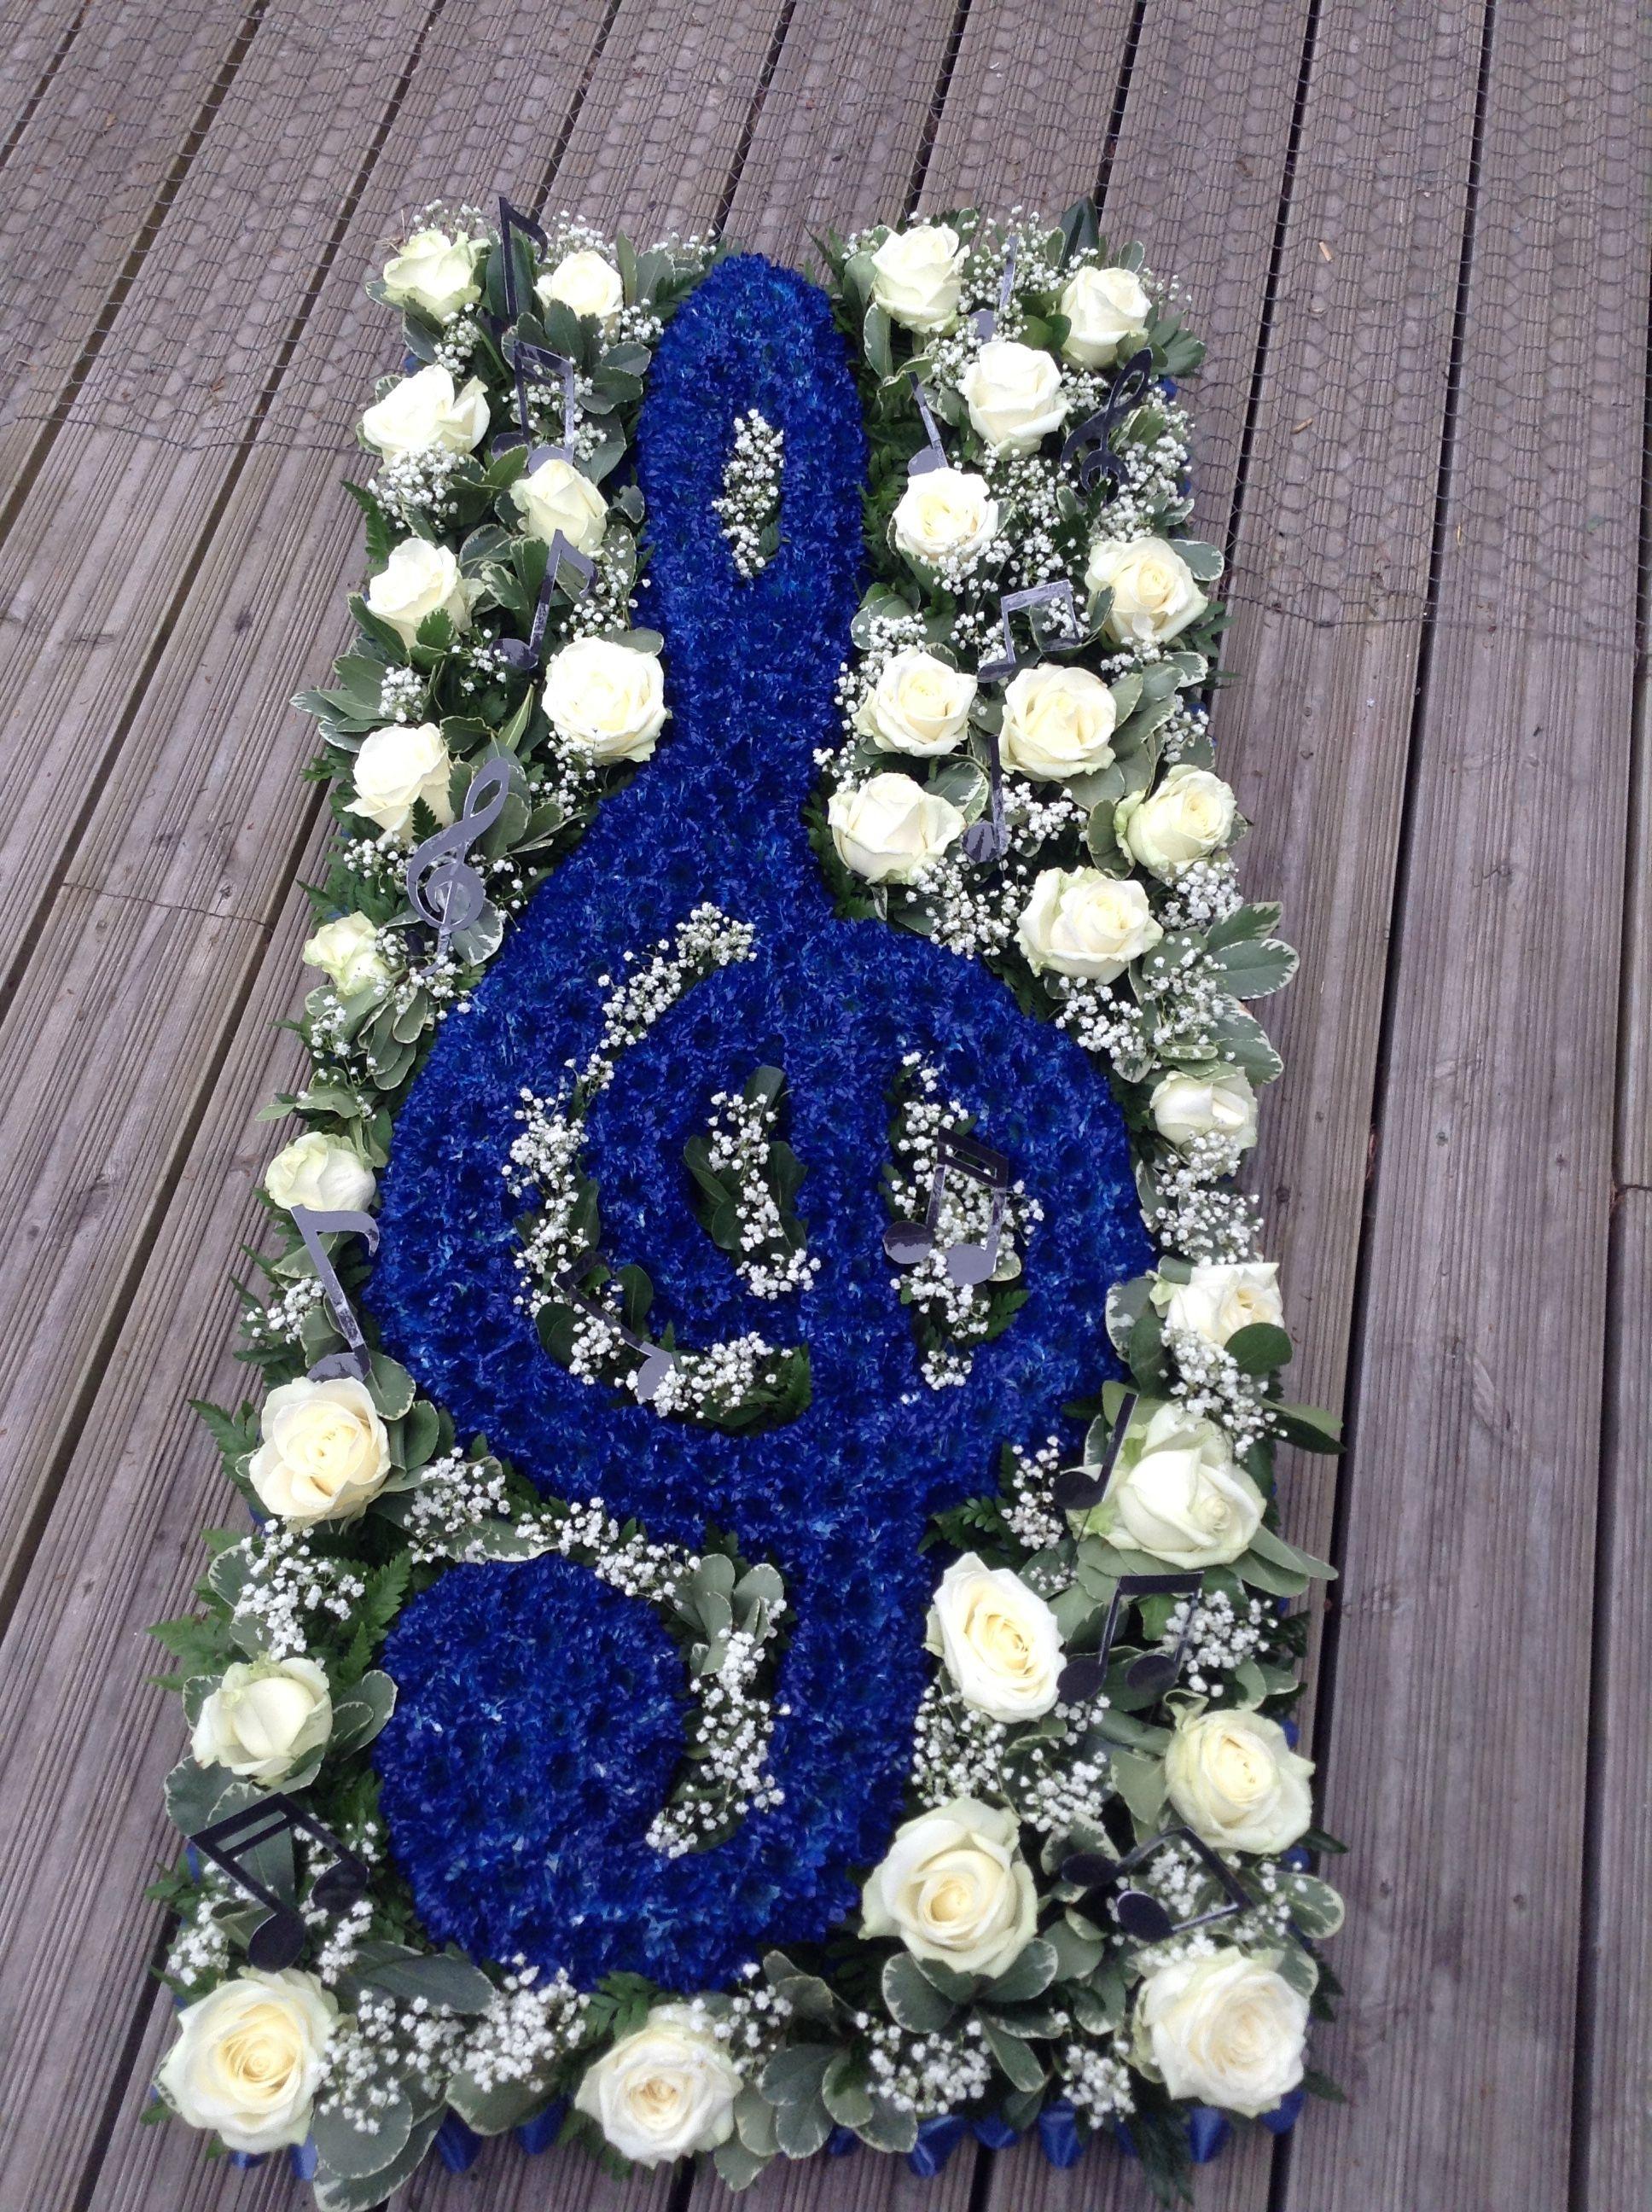 Funeral Flowers Treble Clef Funeral Flower Tribute 4ft Treble Clef Flower Display Ww Funeral Flowers Funeral Flower Arrangements Funeral Floral Arrangements